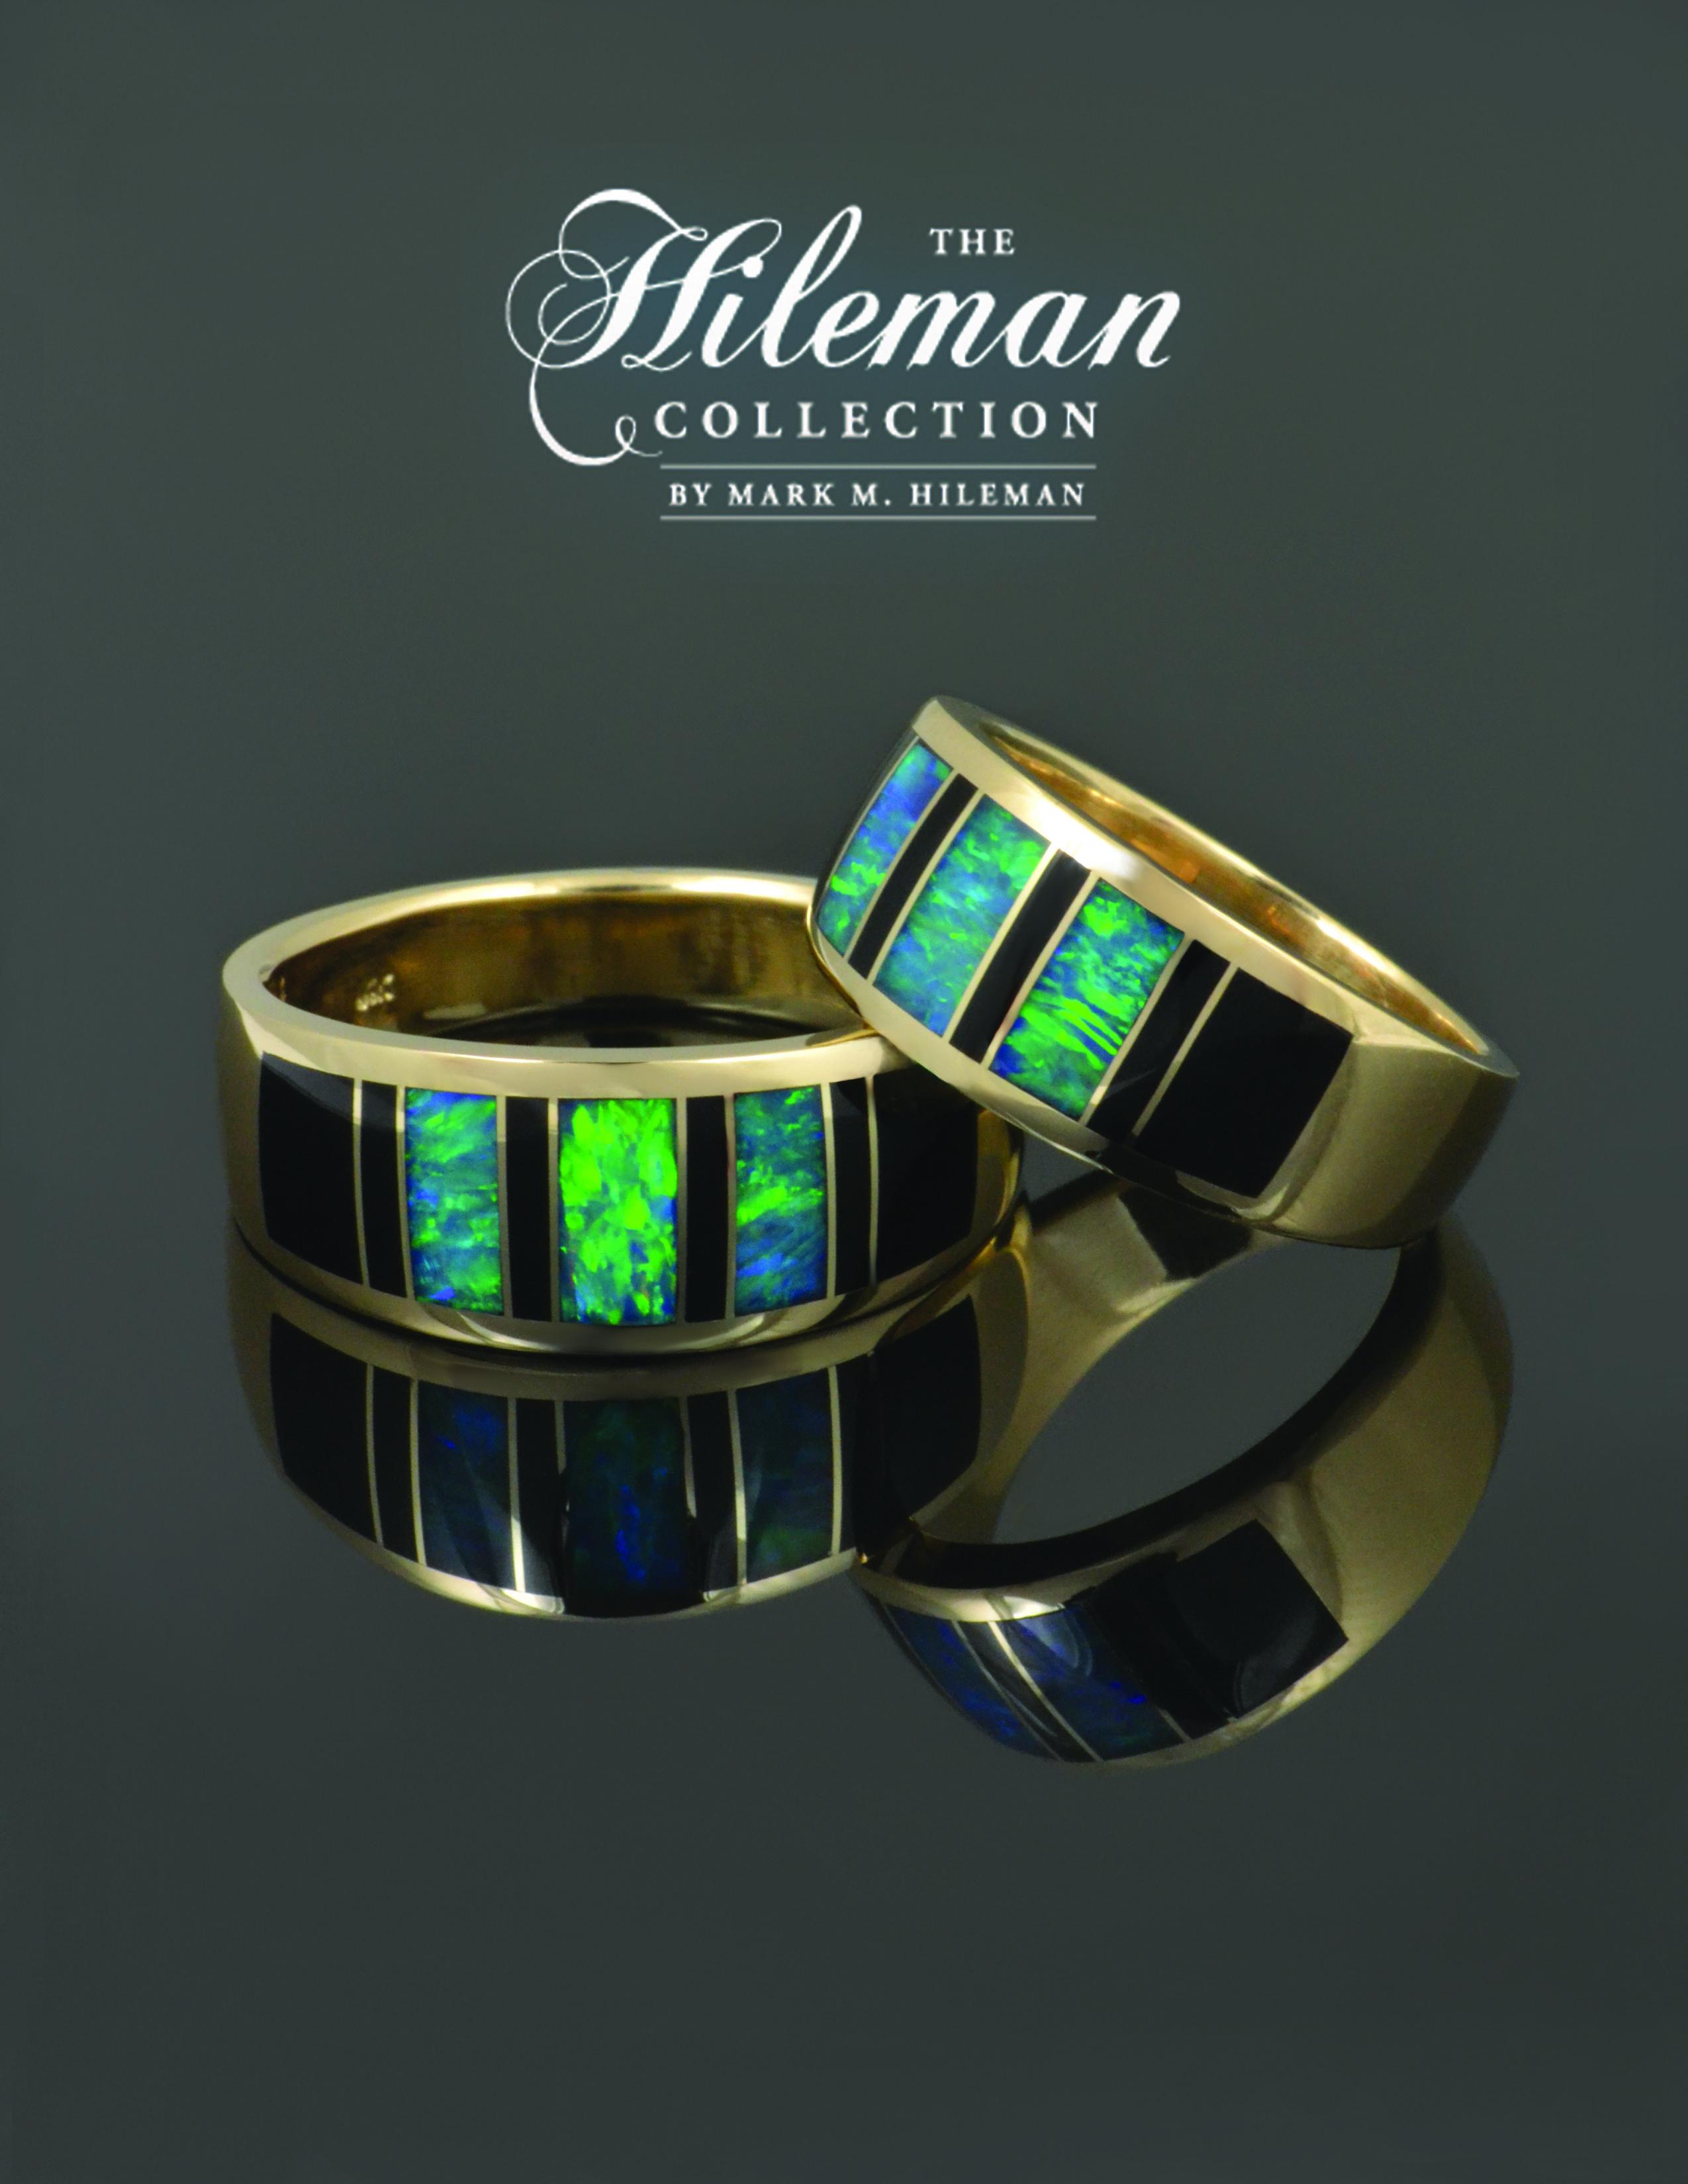 Black onyx and Australian opal wedding ring set